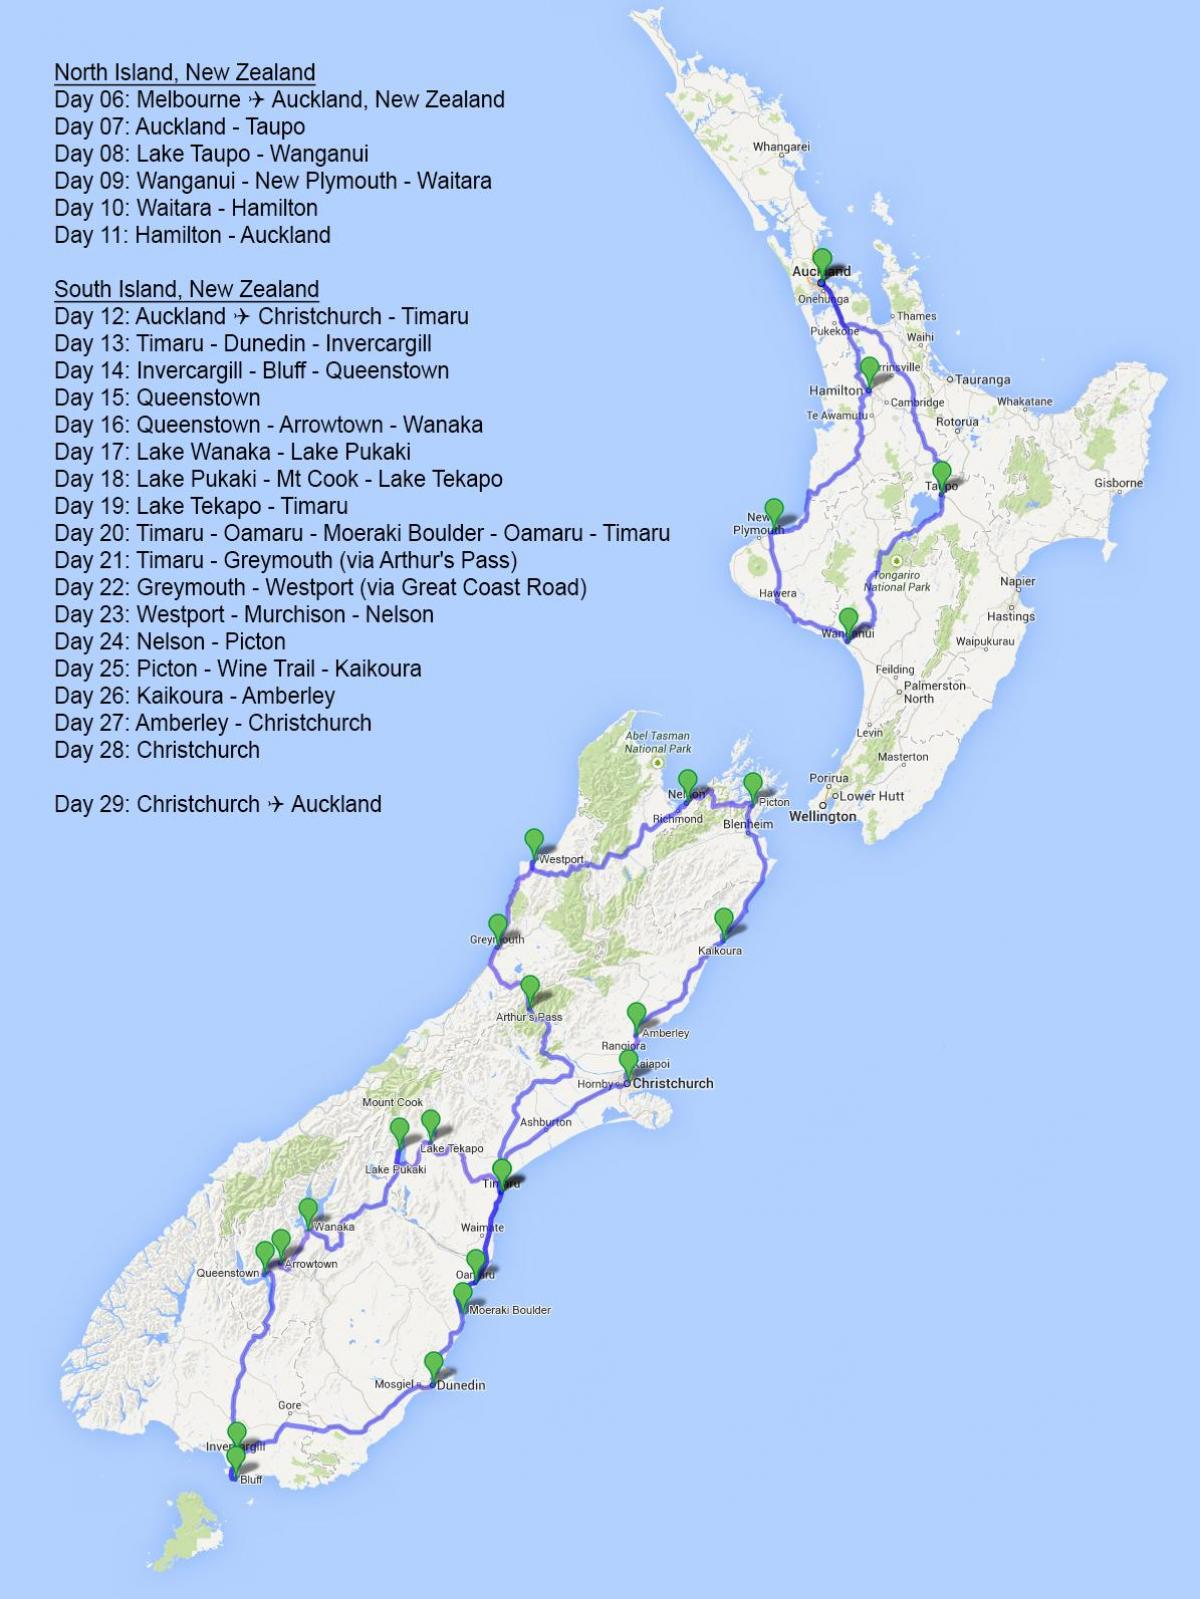 Uusi Seelanti Trip Planner Kartta Kartta Uuden Seelannin Trip